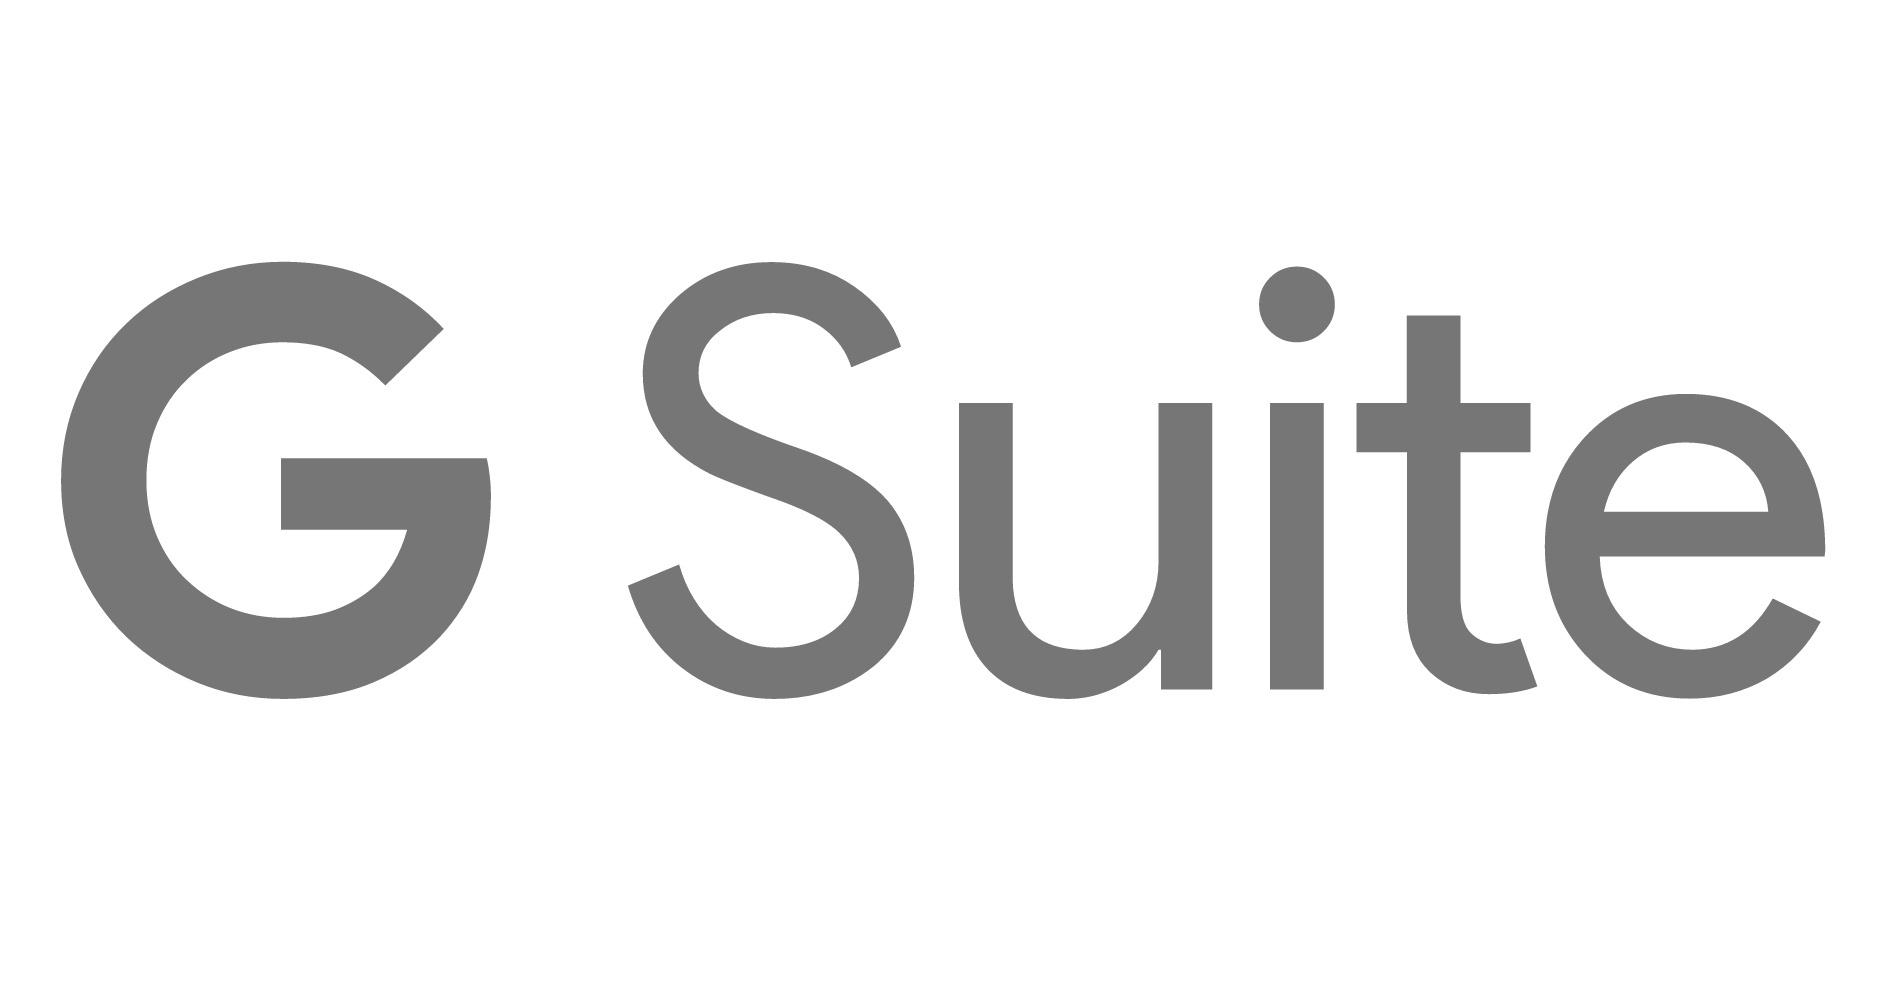 G Suite Logo courtesy of Google